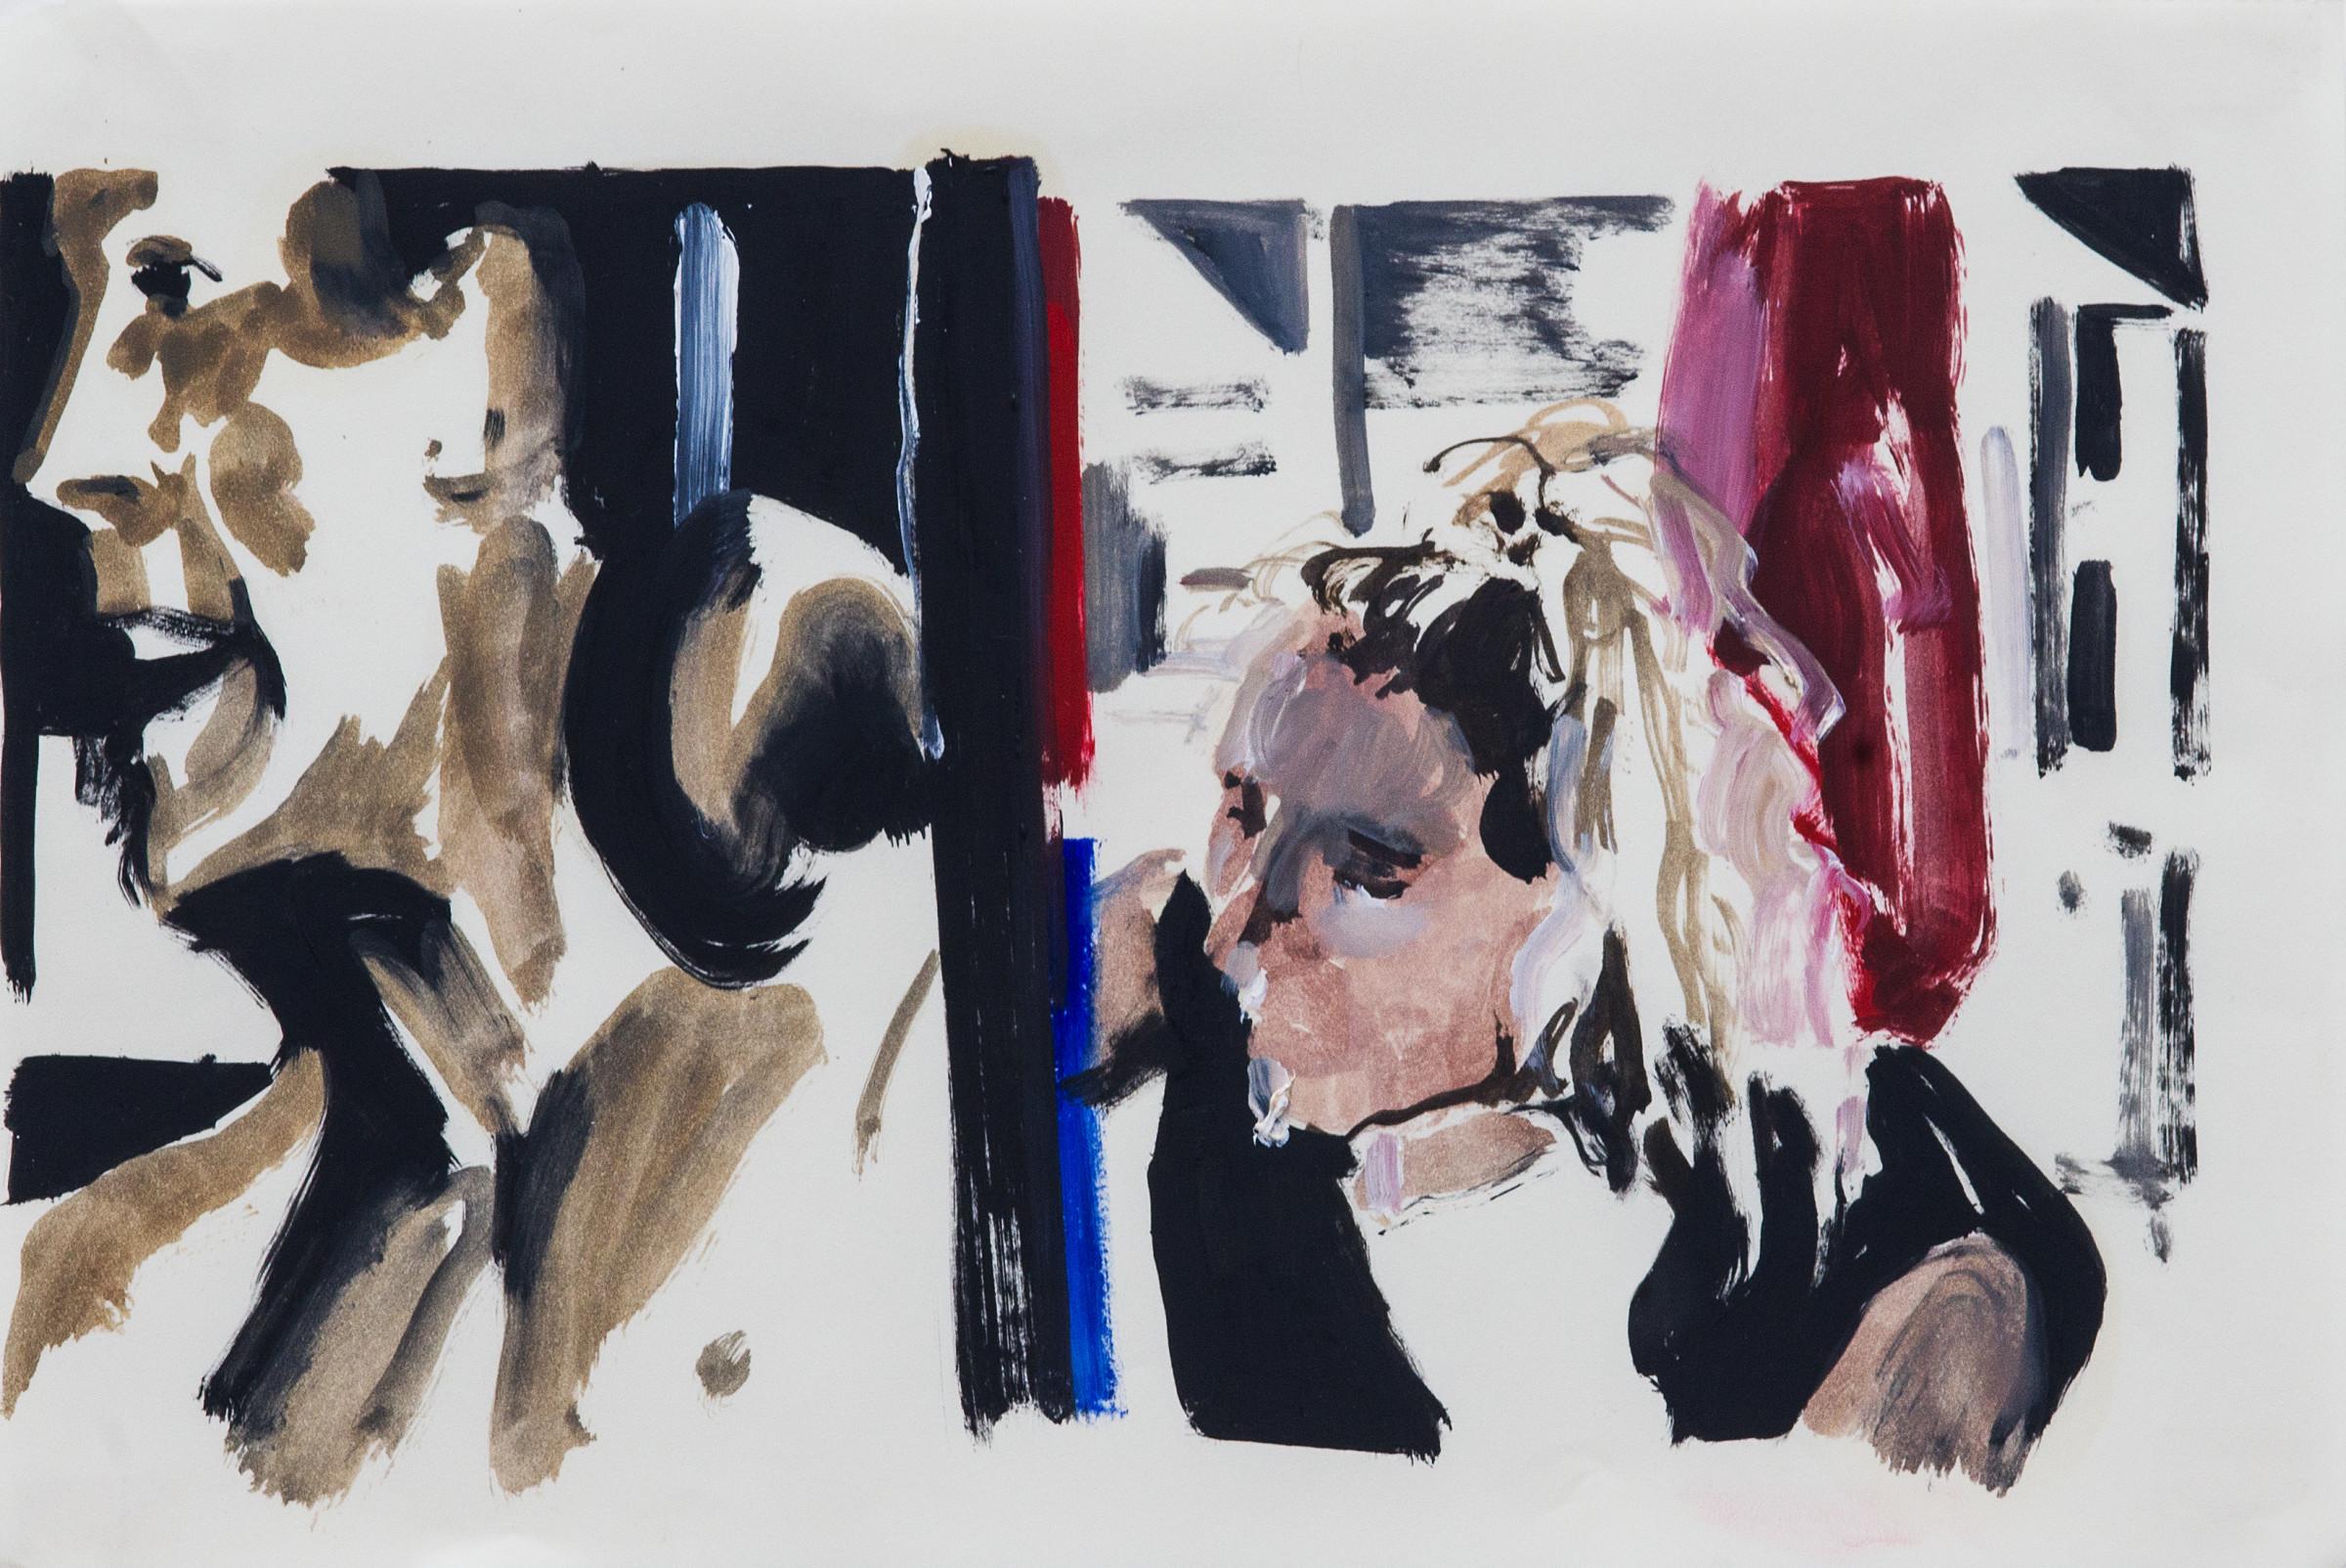 "<span class=""link fancybox-details-link""><a href=""/exhibitions/40/works/artworks1930/"">View Detail Page</a></span><div class=""artist""><strong>Eleanor Watson</strong></div><div class=""title""><em>Juliette study</em>, 2017</div><div class=""medium"">Oil on paper</div><div class=""dimensions"">20 x 30 cm<br>7 7/8 x 11 3/4 in.</div>"